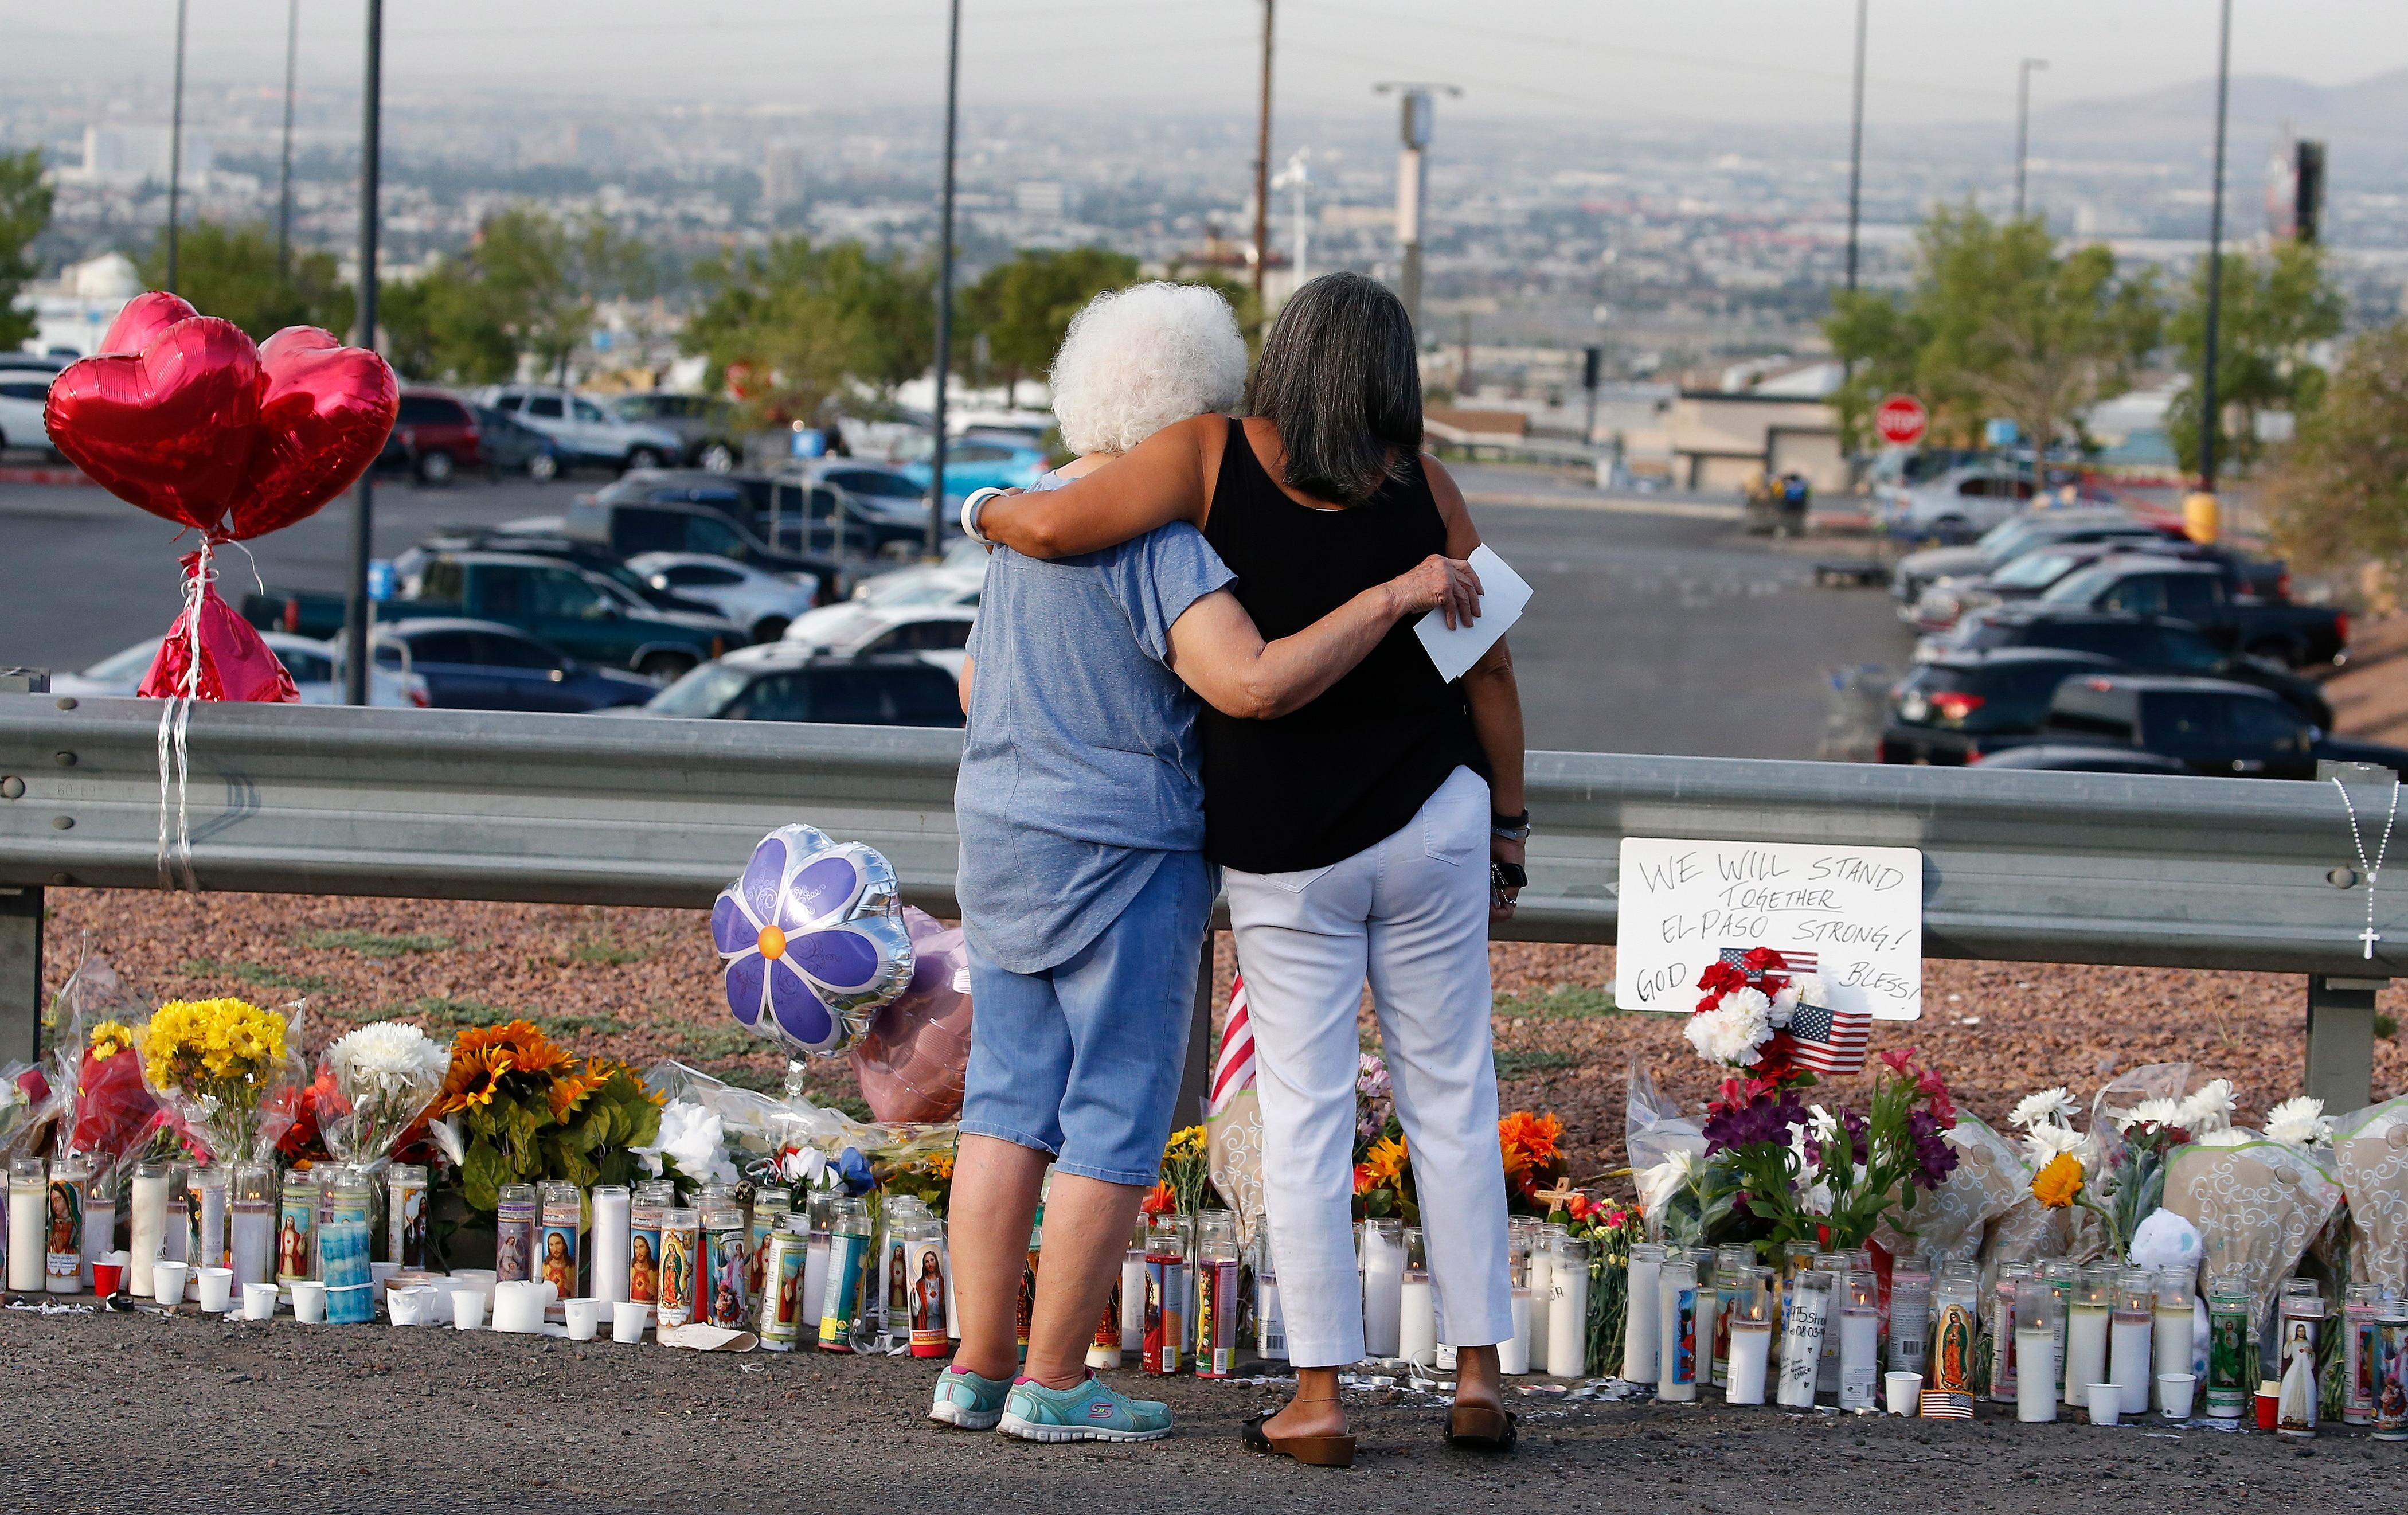 Emma Del Valle hugs Brenda Castaneda at a make shift memorial in El Paso.